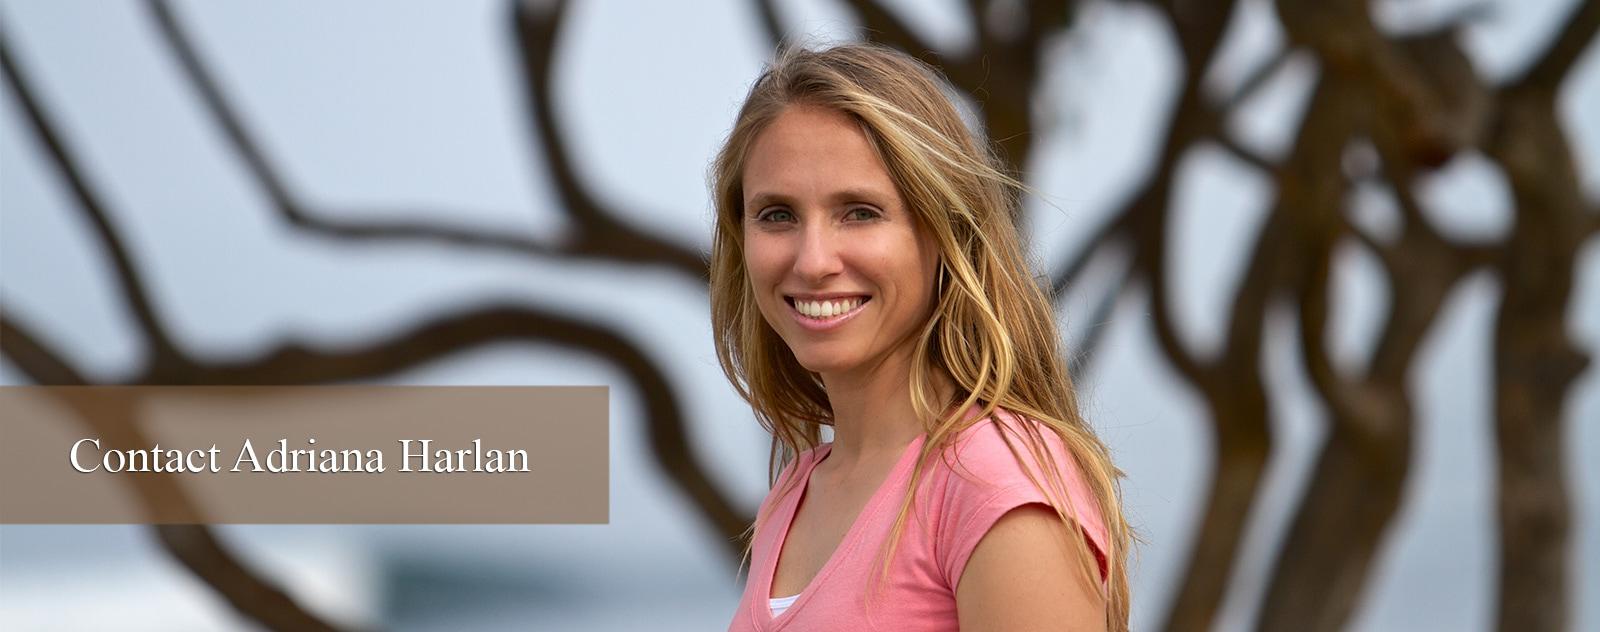 Contact Adriana Harlan